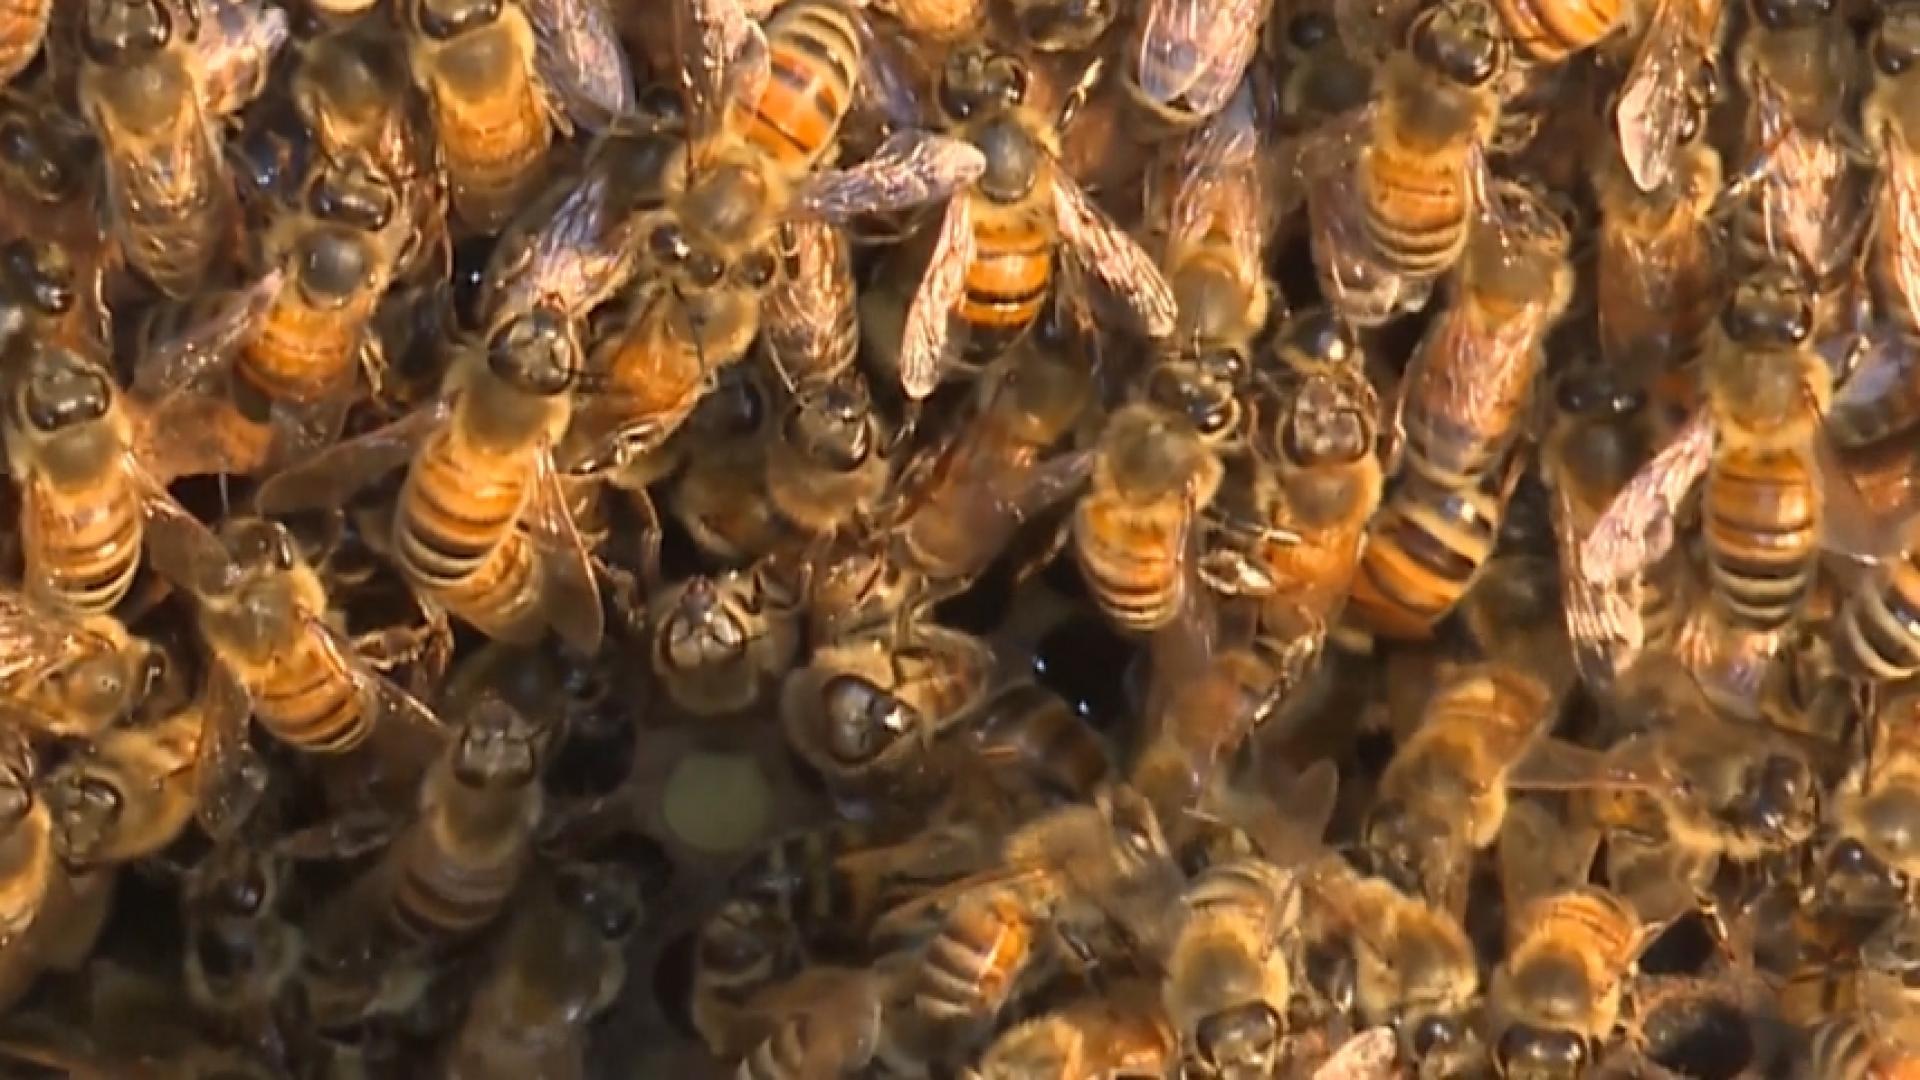 NC_bees0504_1920x1080_1554825580069.jpg